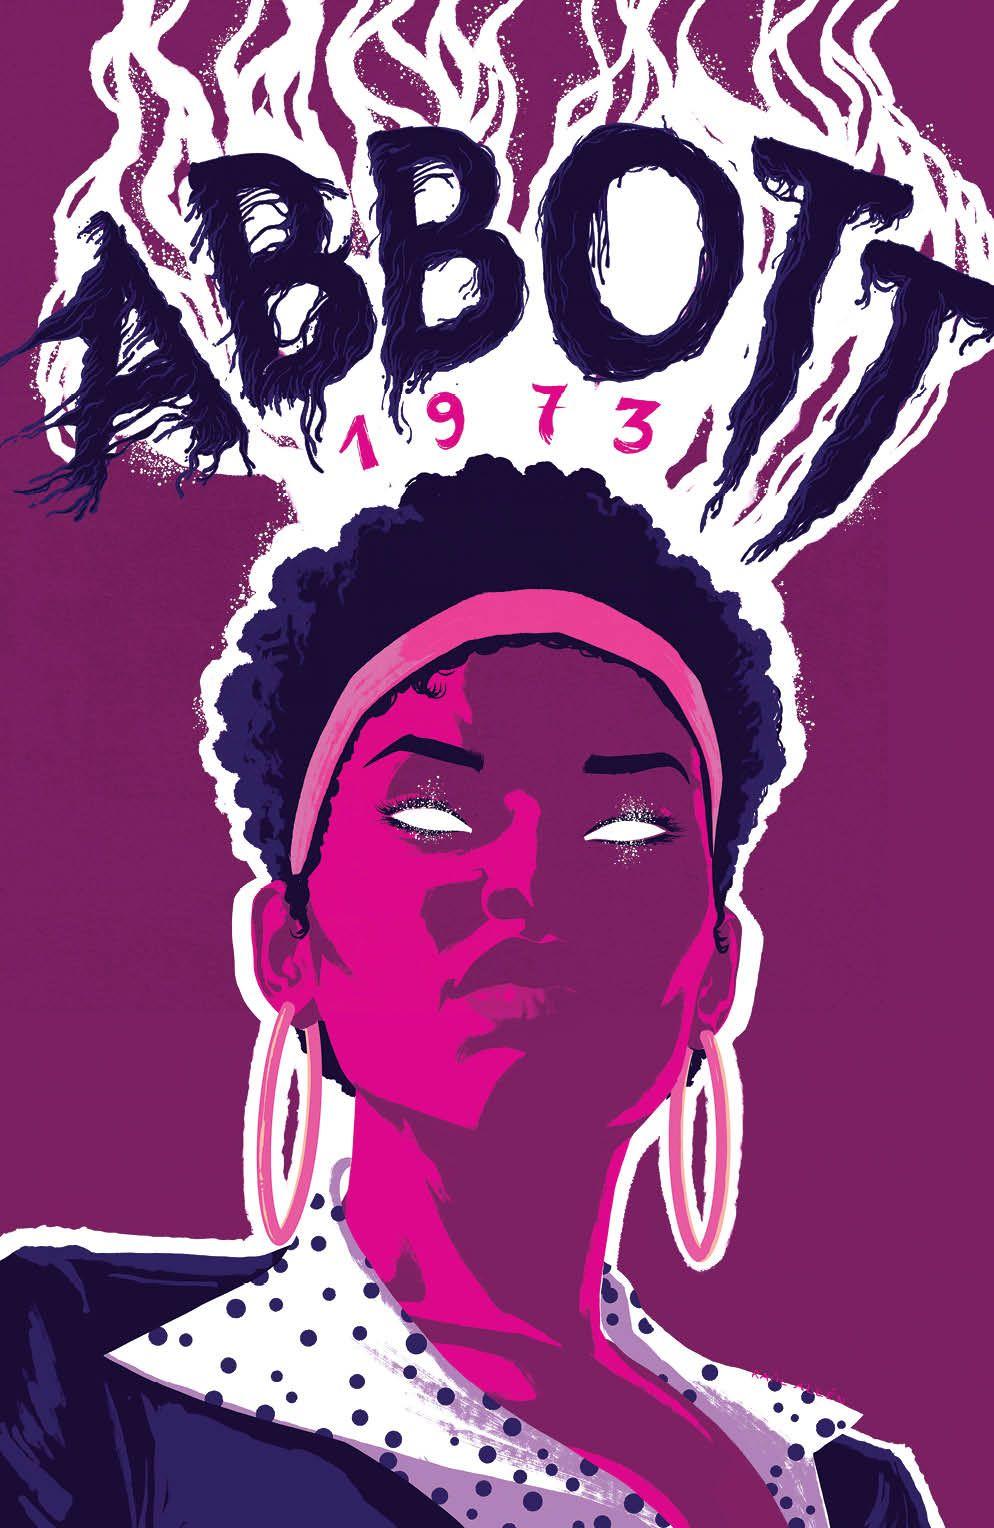 Abbott_1973_005_Cover_B_Variant ComicList: BOOM! Studios New Releases for 05/26/2021